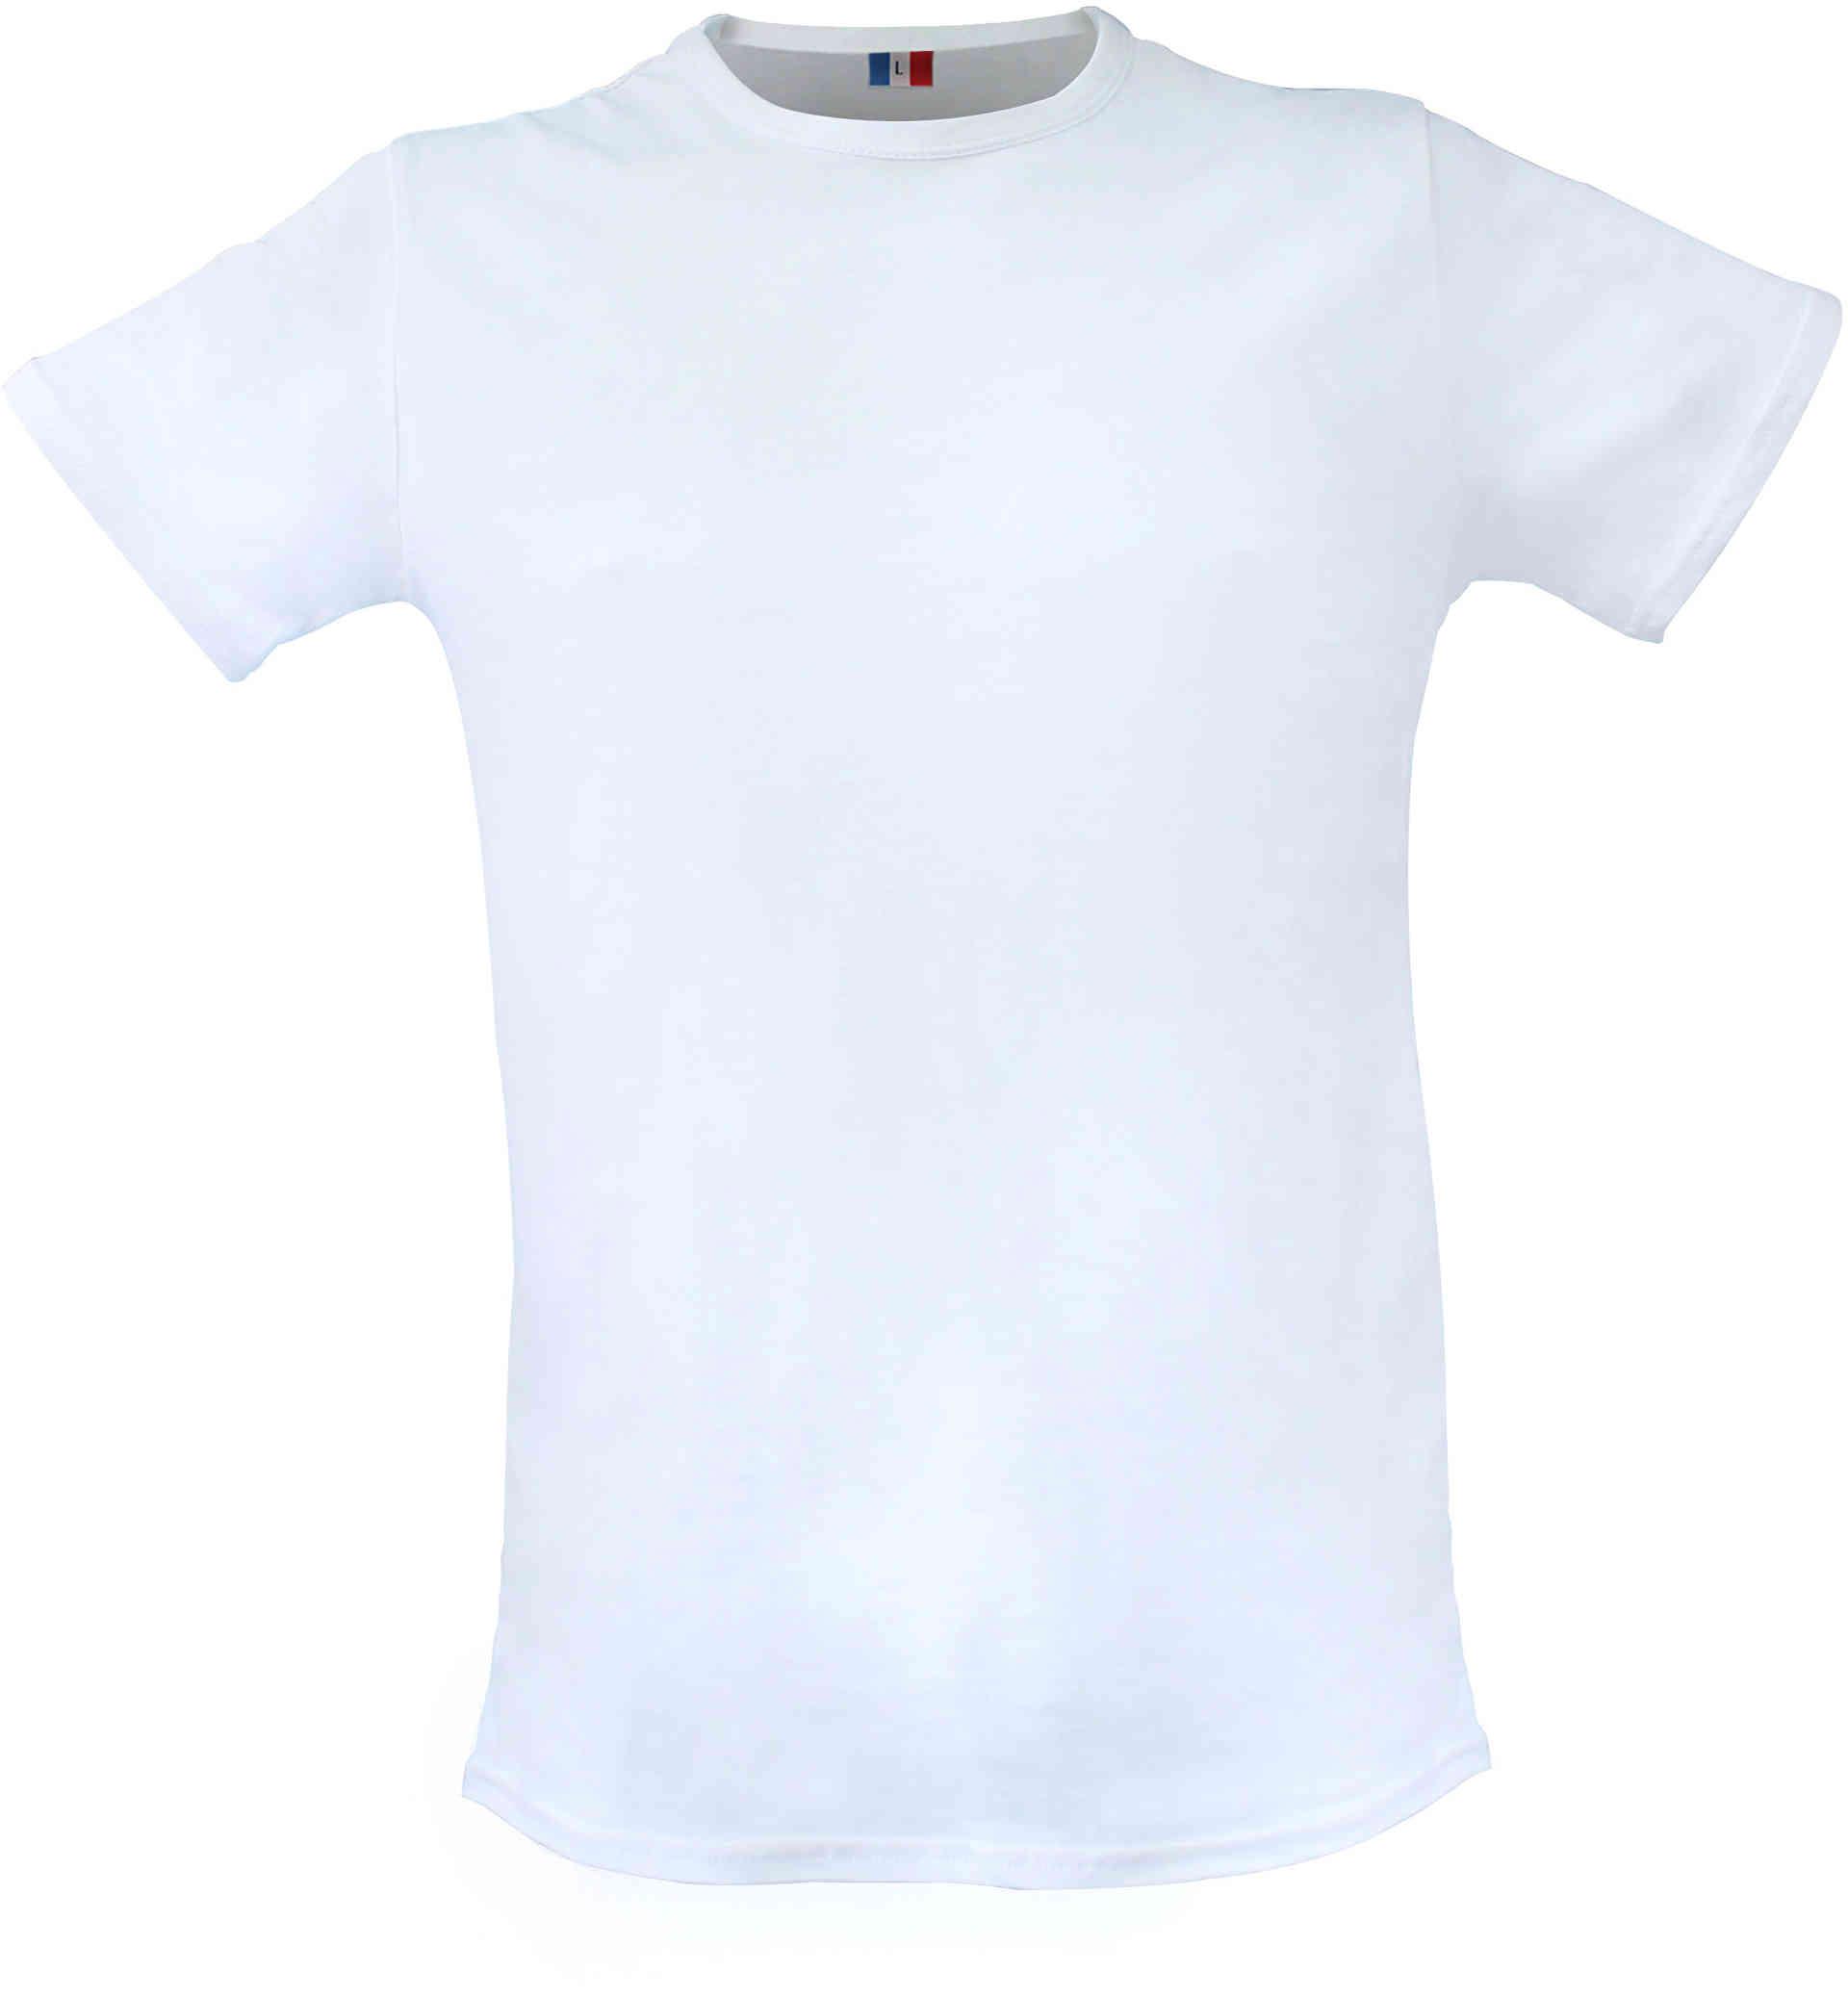 tee shirt personnalis tee shirt homme origine france garantie alb blanc. Black Bedroom Furniture Sets. Home Design Ideas